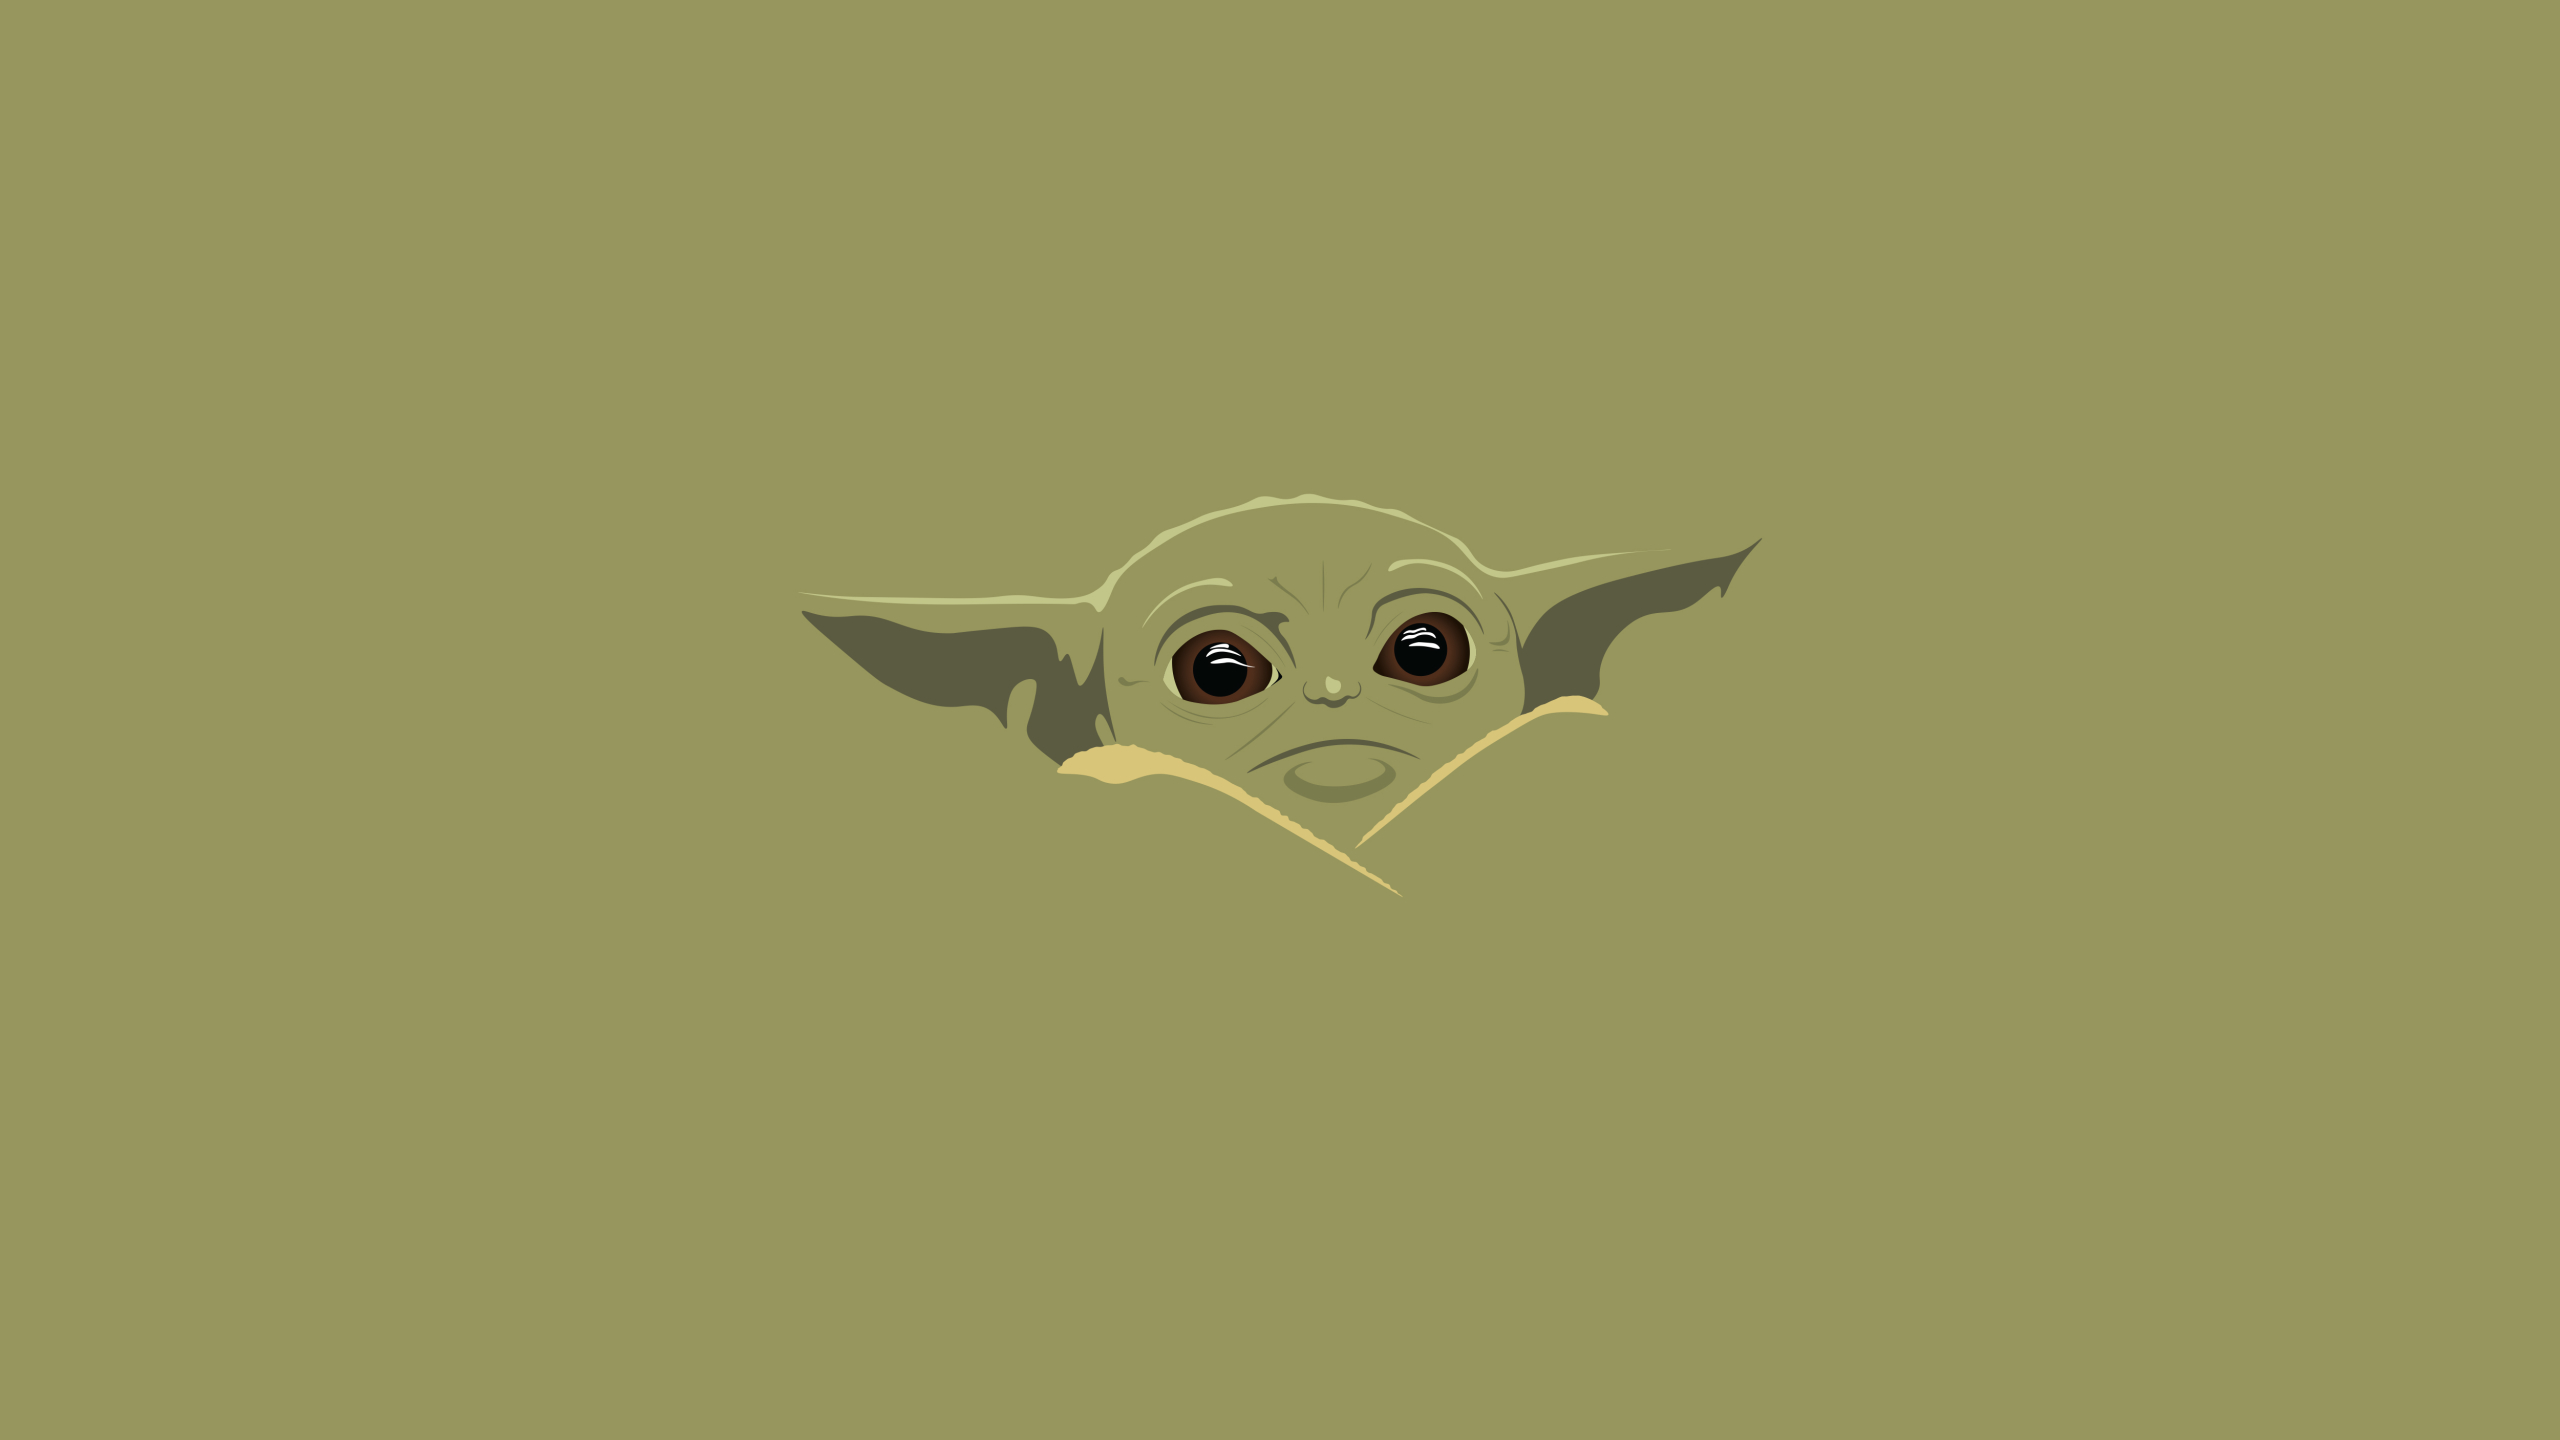 4k Wallpaper Baby Yoda Hd